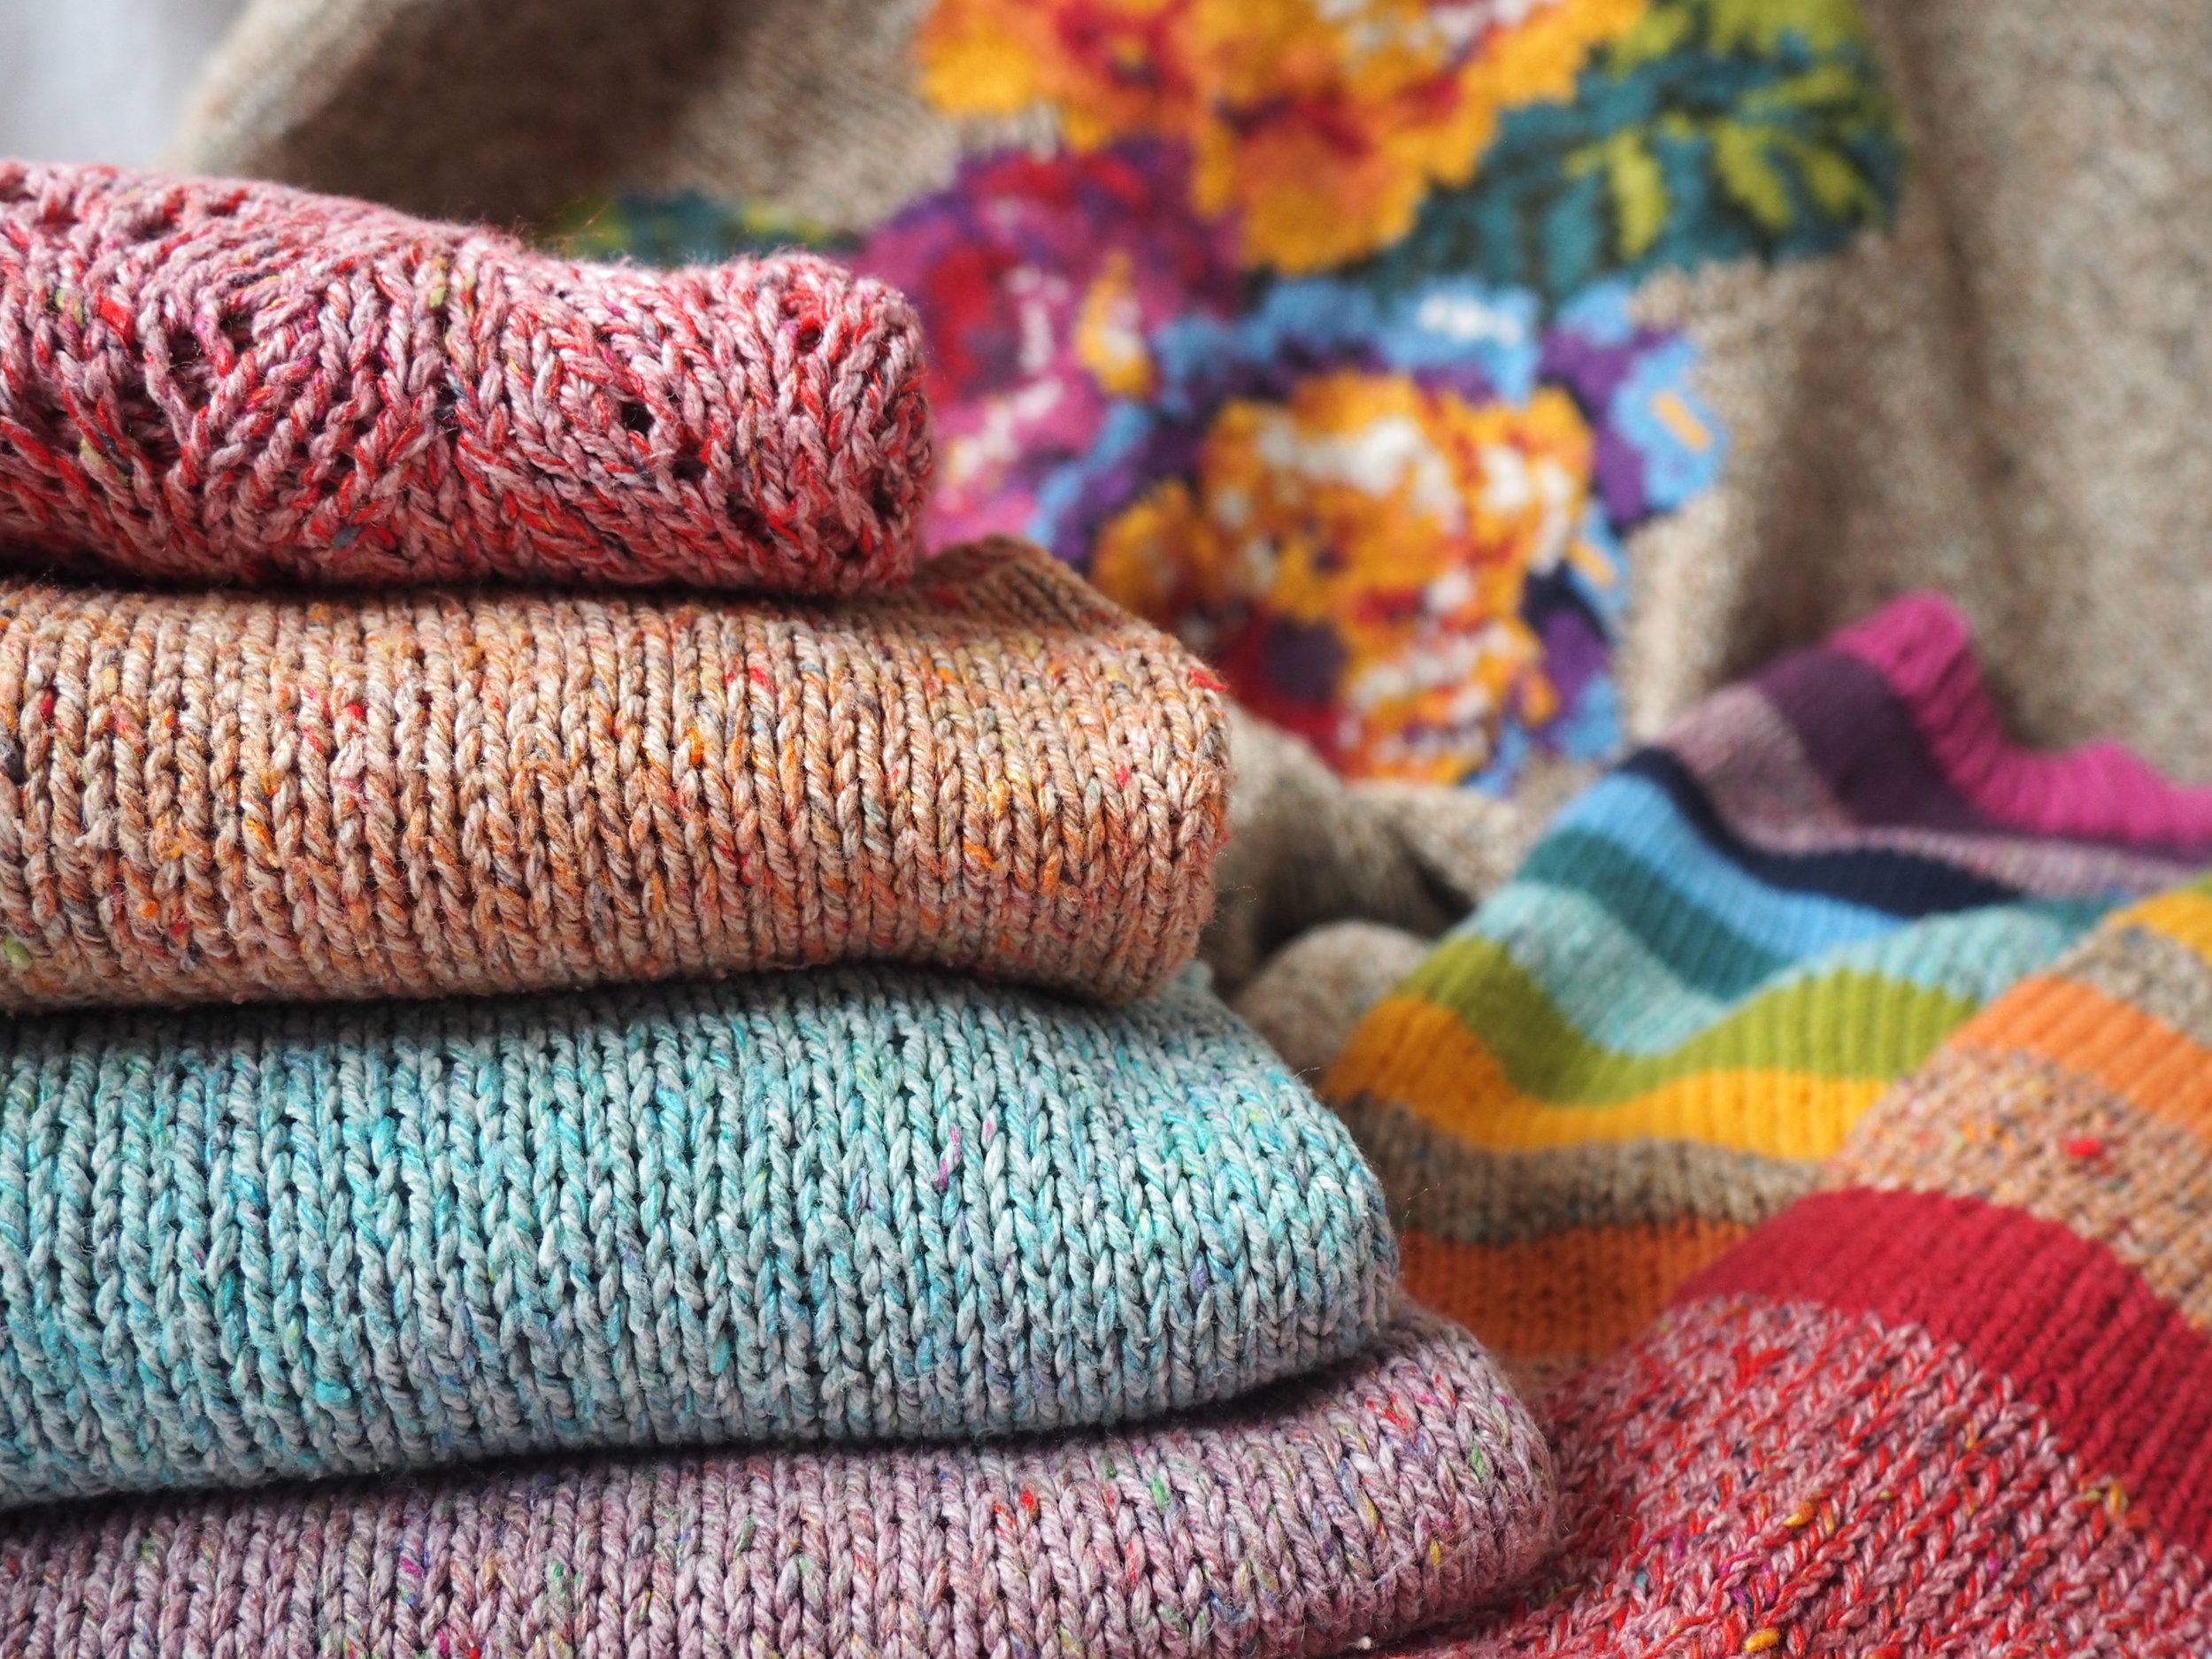 Rainbow knitting landscape - JCockcroft.JPG